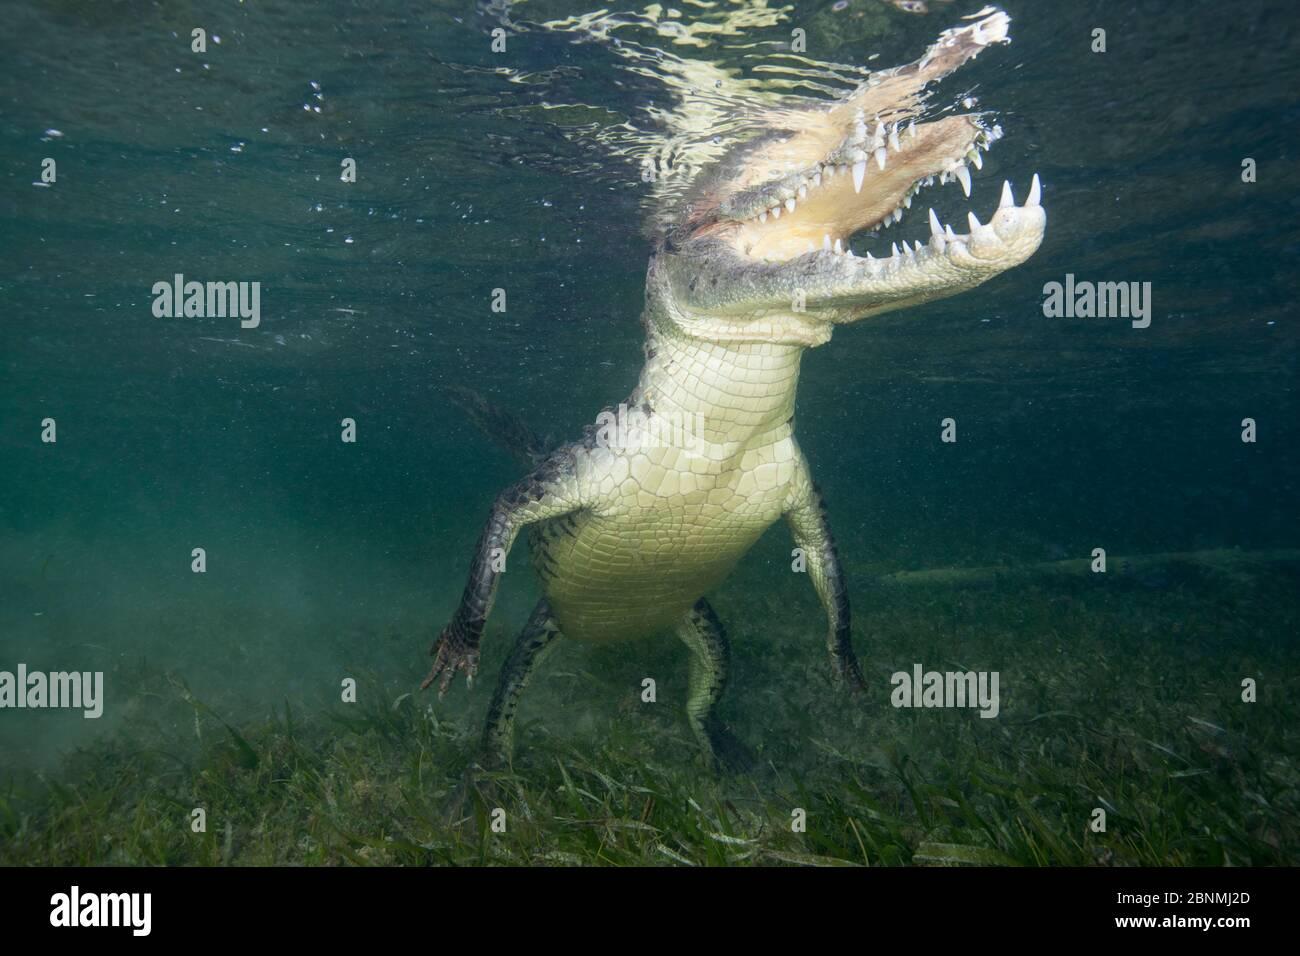 American crocodile (Crocodylus acutus) surfacing to breath, Banco Chinchorro Biosphere Reserve, Caribbean region, Mexico Stock Photo